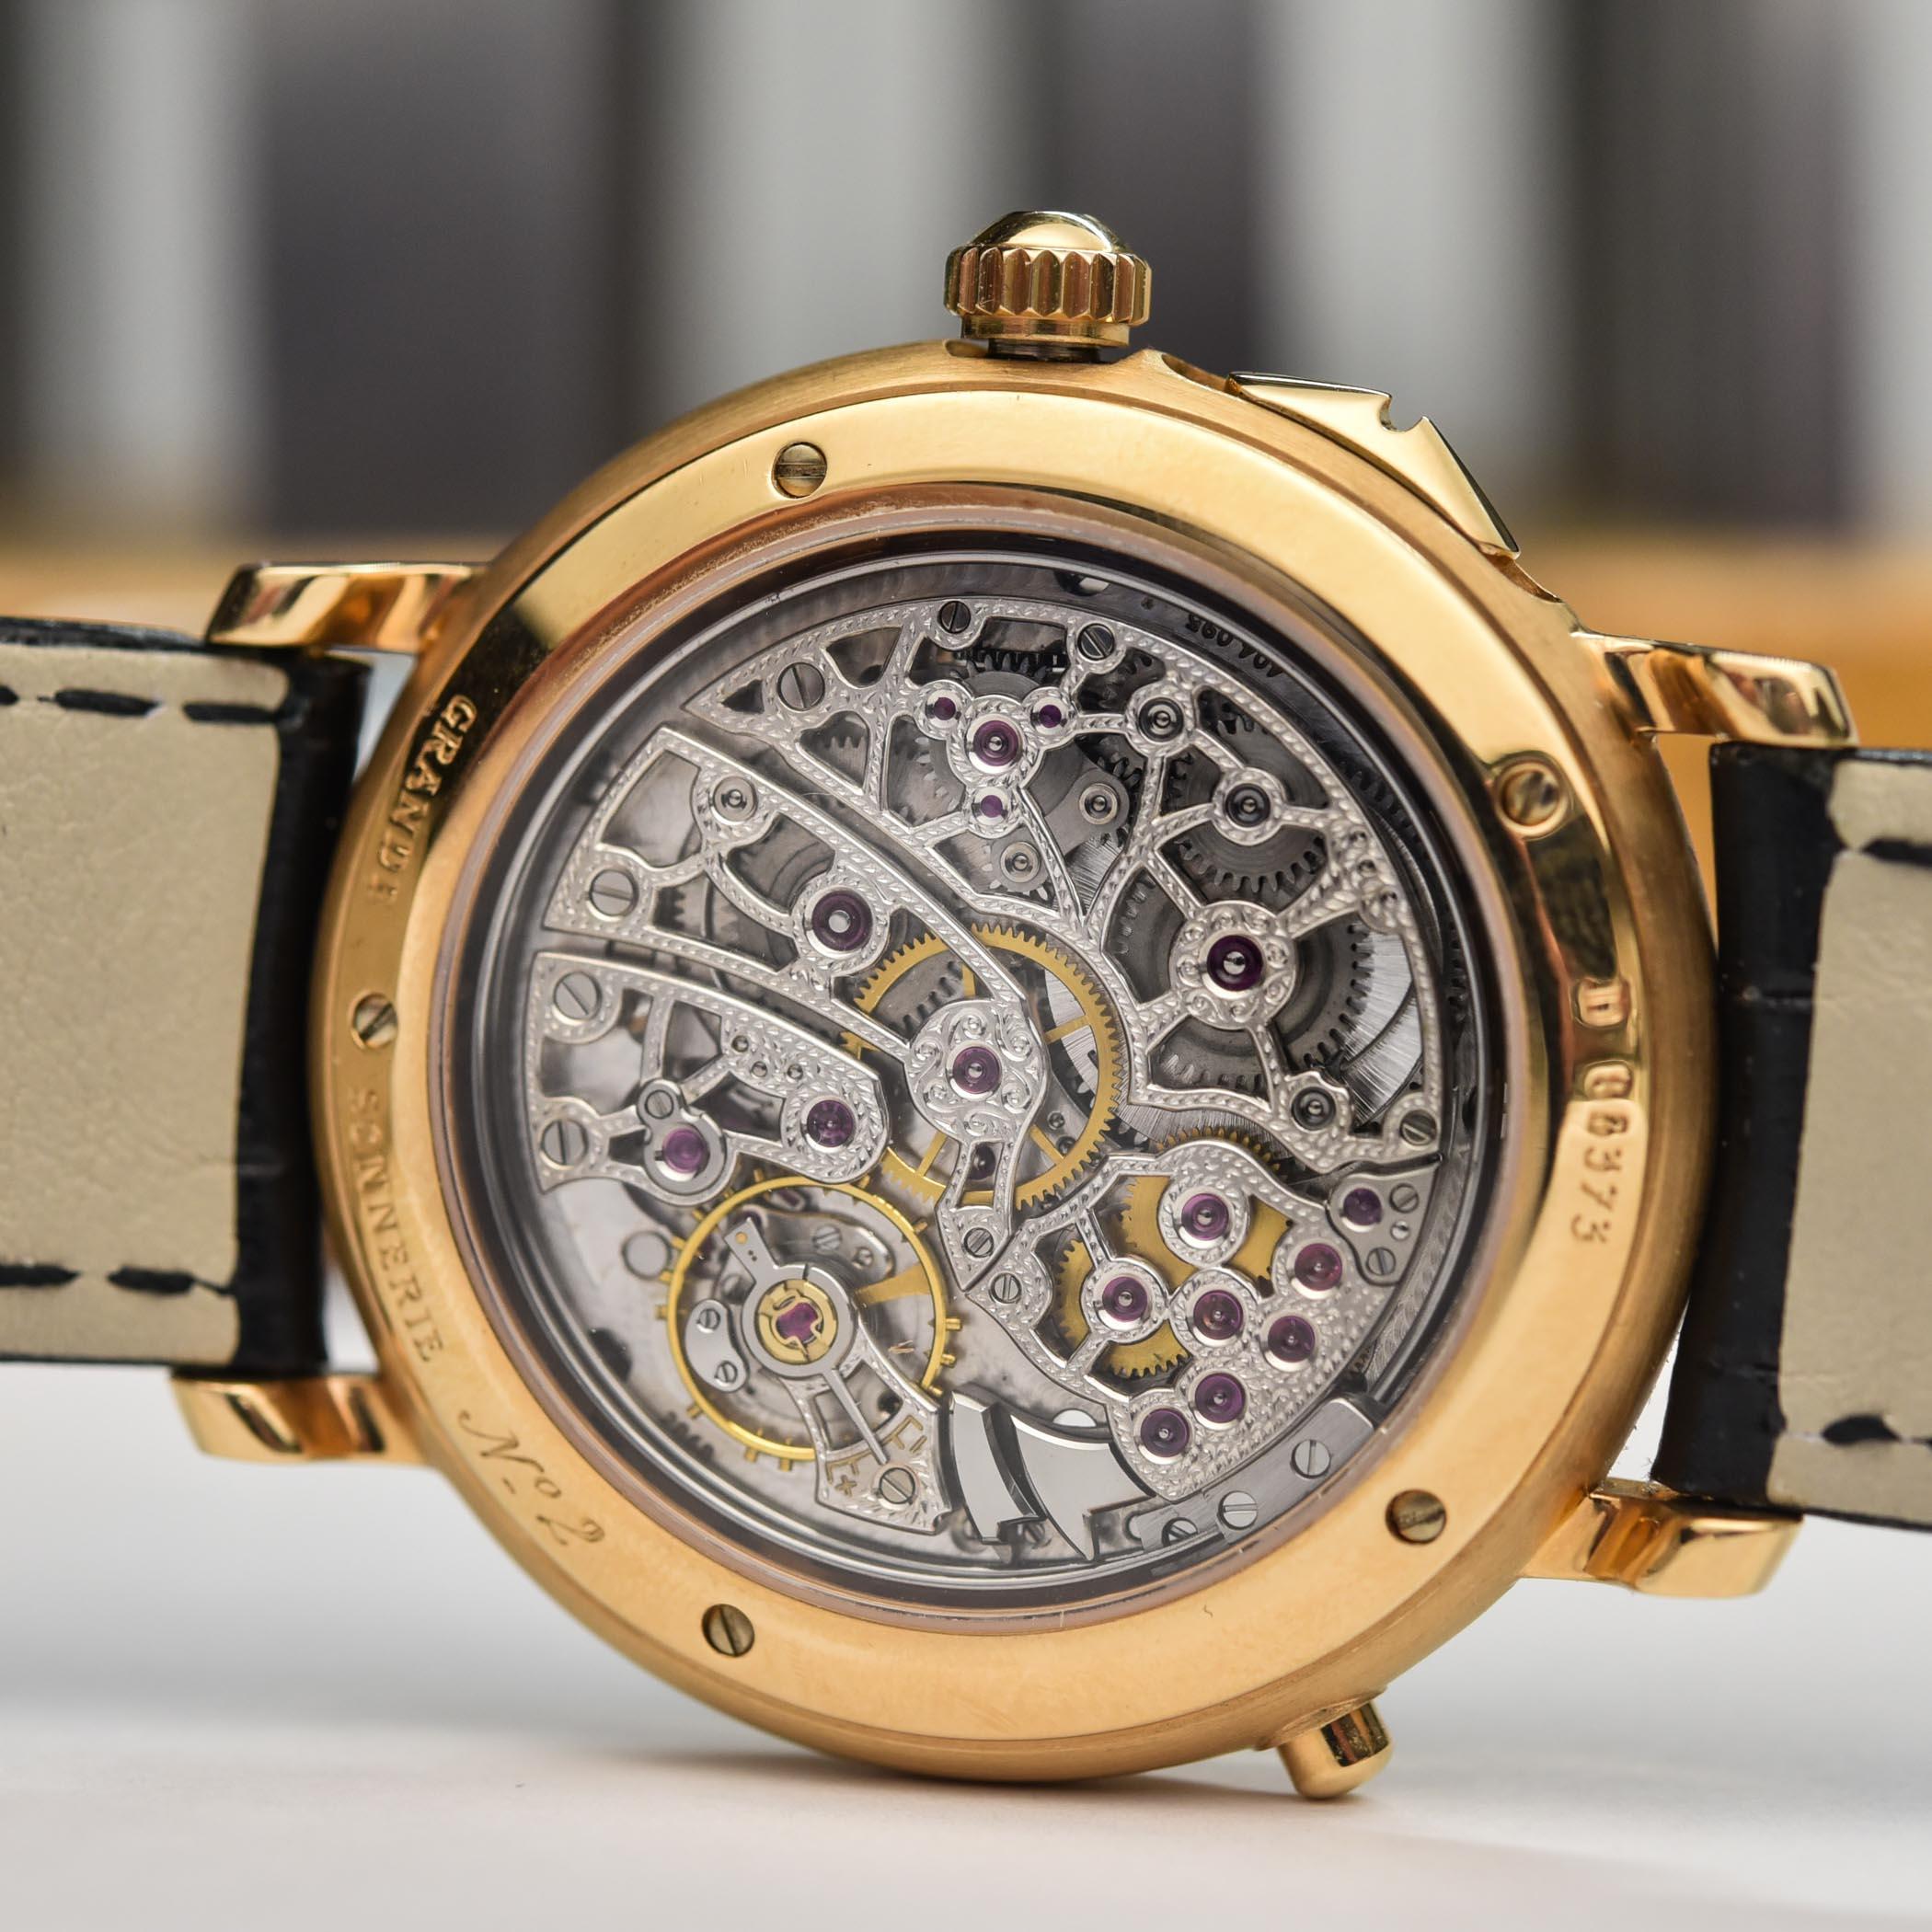 Audemars Piguet quarter repeating grande and petite sonnerie wristwatch 25847BA calibre 2868